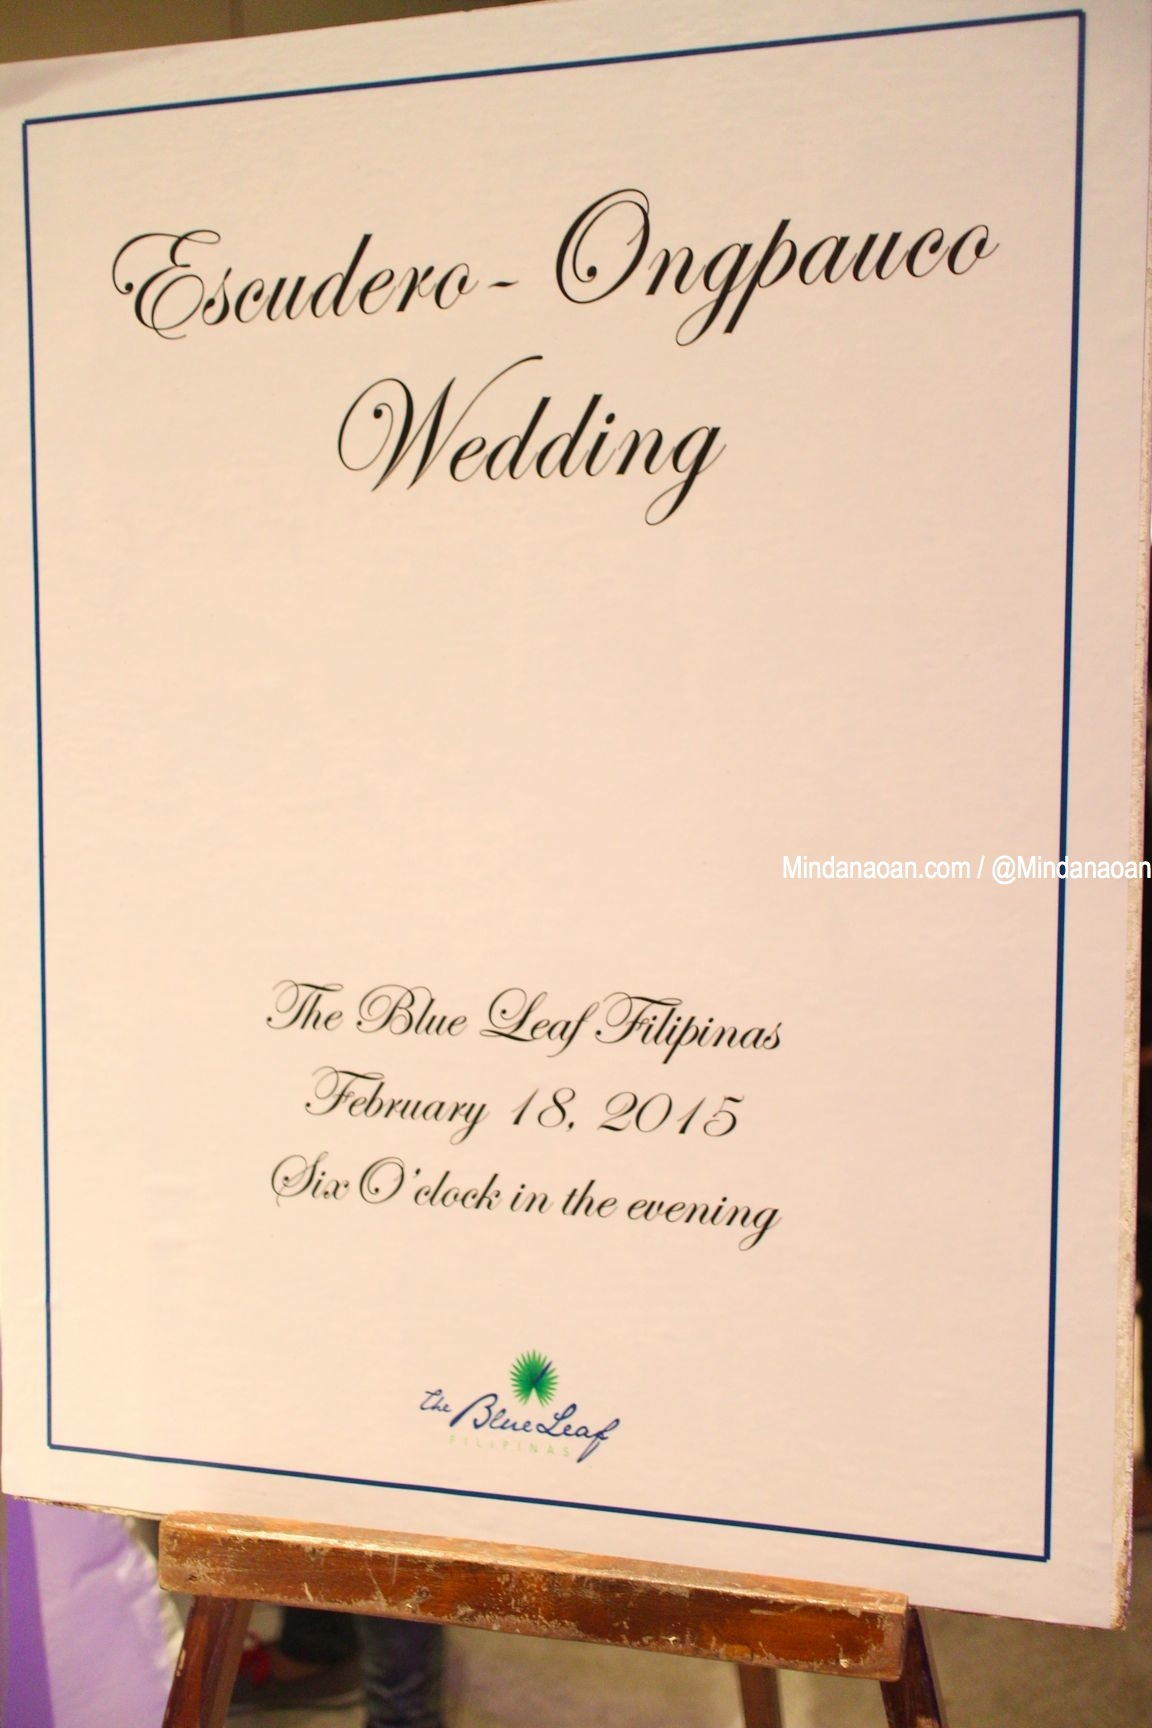 At the Senator Chiz Escudero – Heart Evangelista wedding